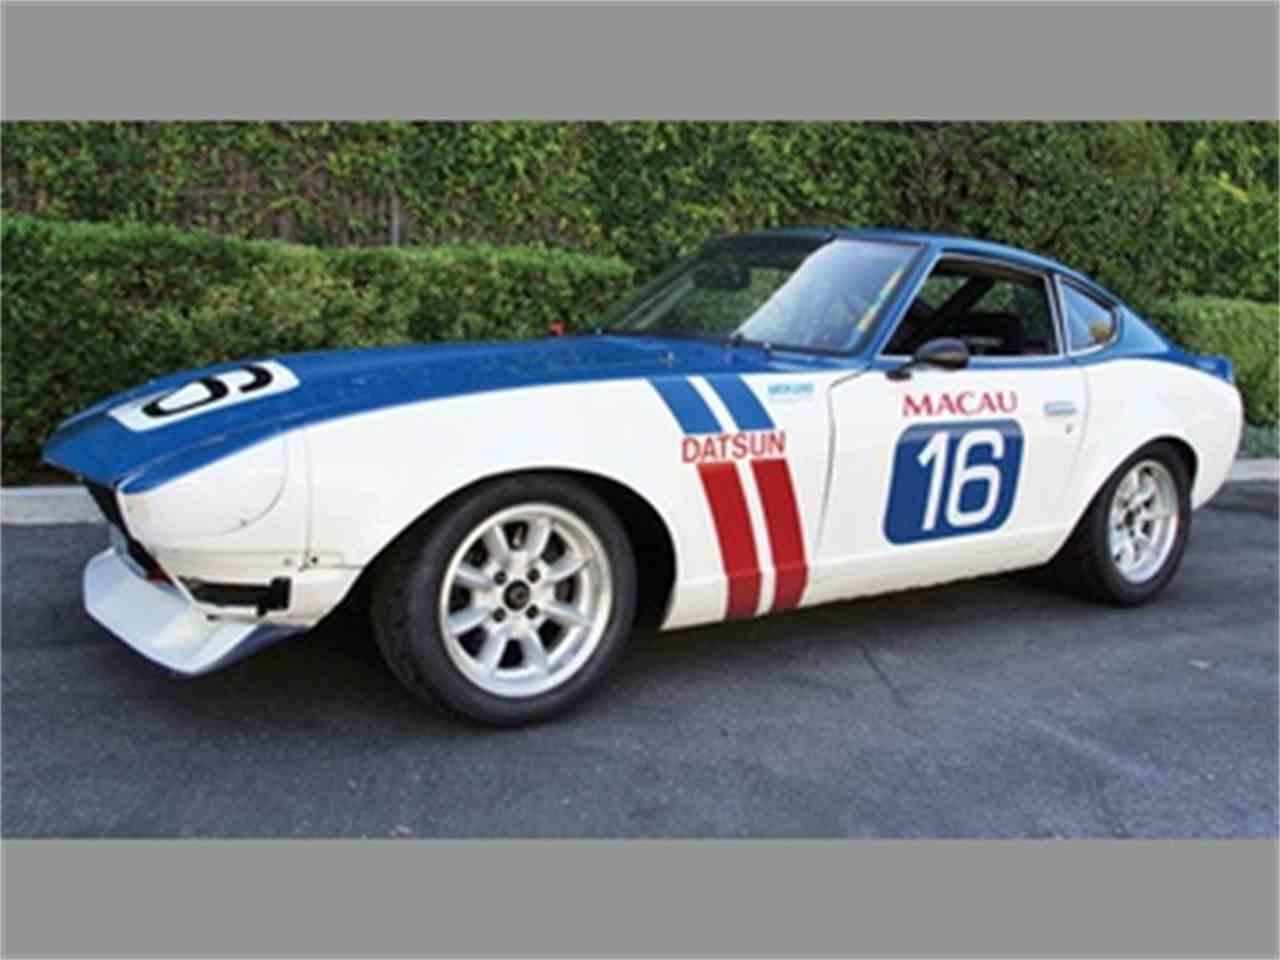 1970 Datsun 240Z Historic Macau F.I.A Race Car for Sale ...